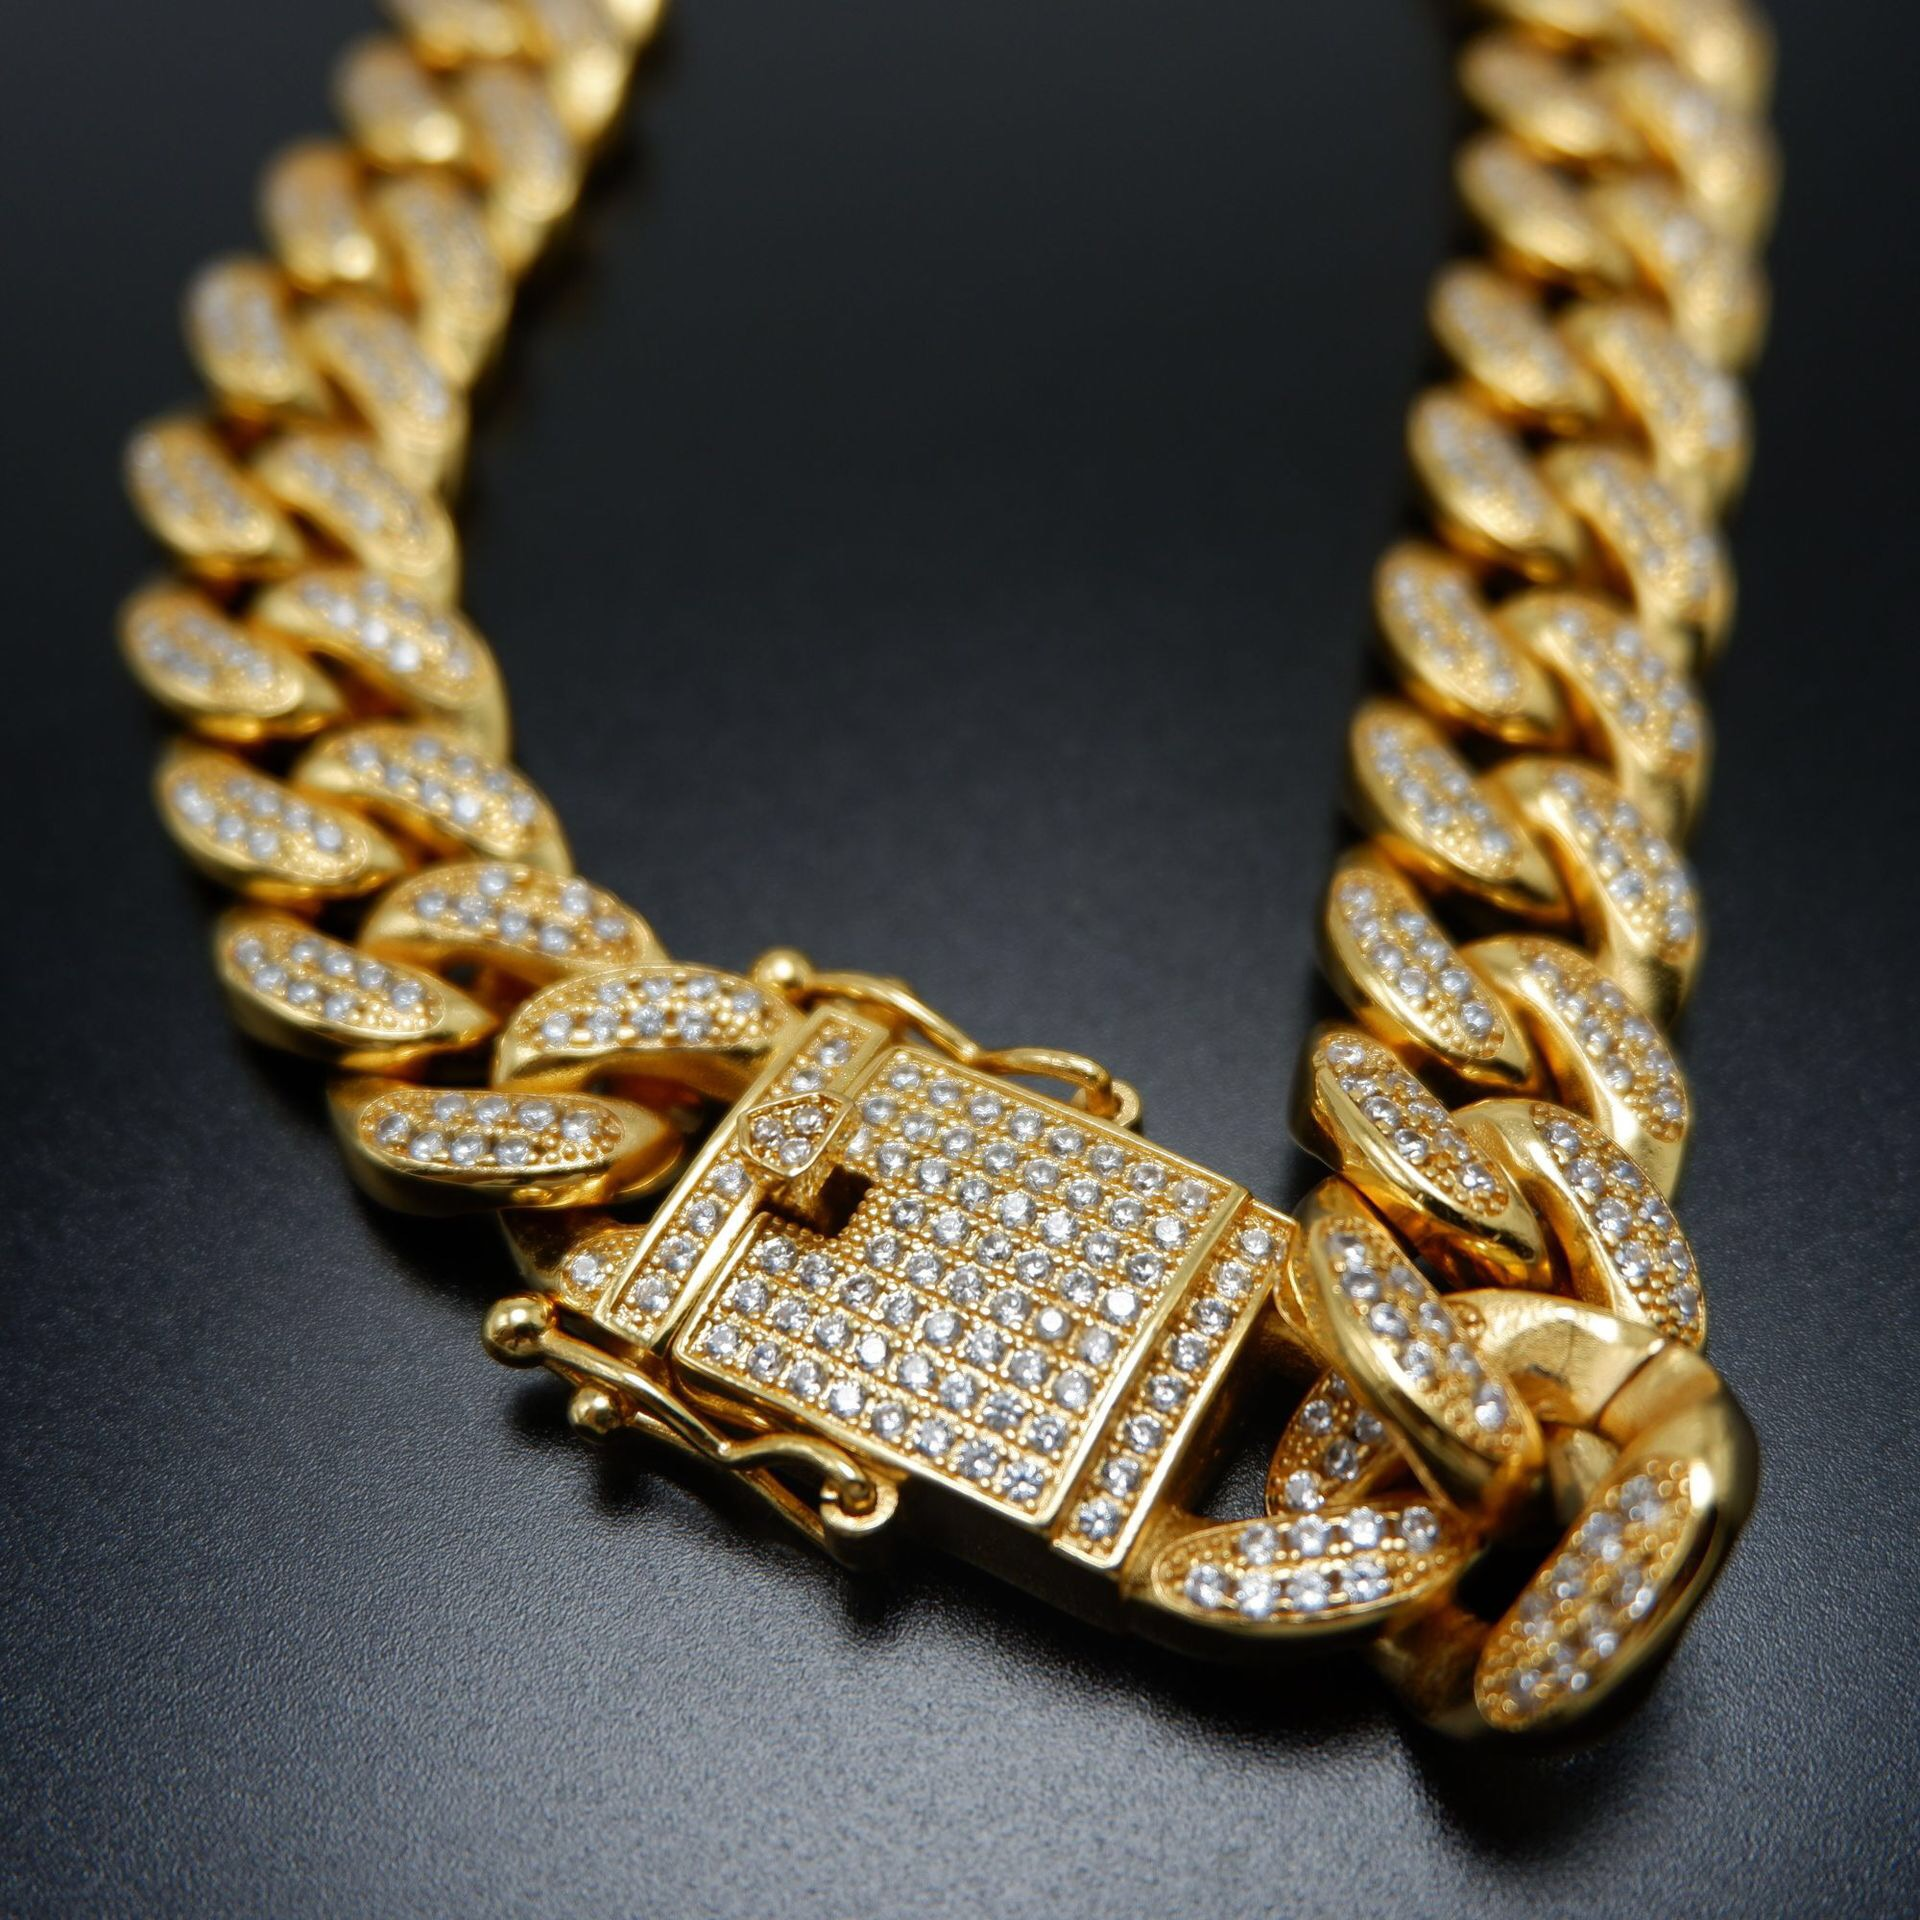 24 Carat Gold Price New Chain